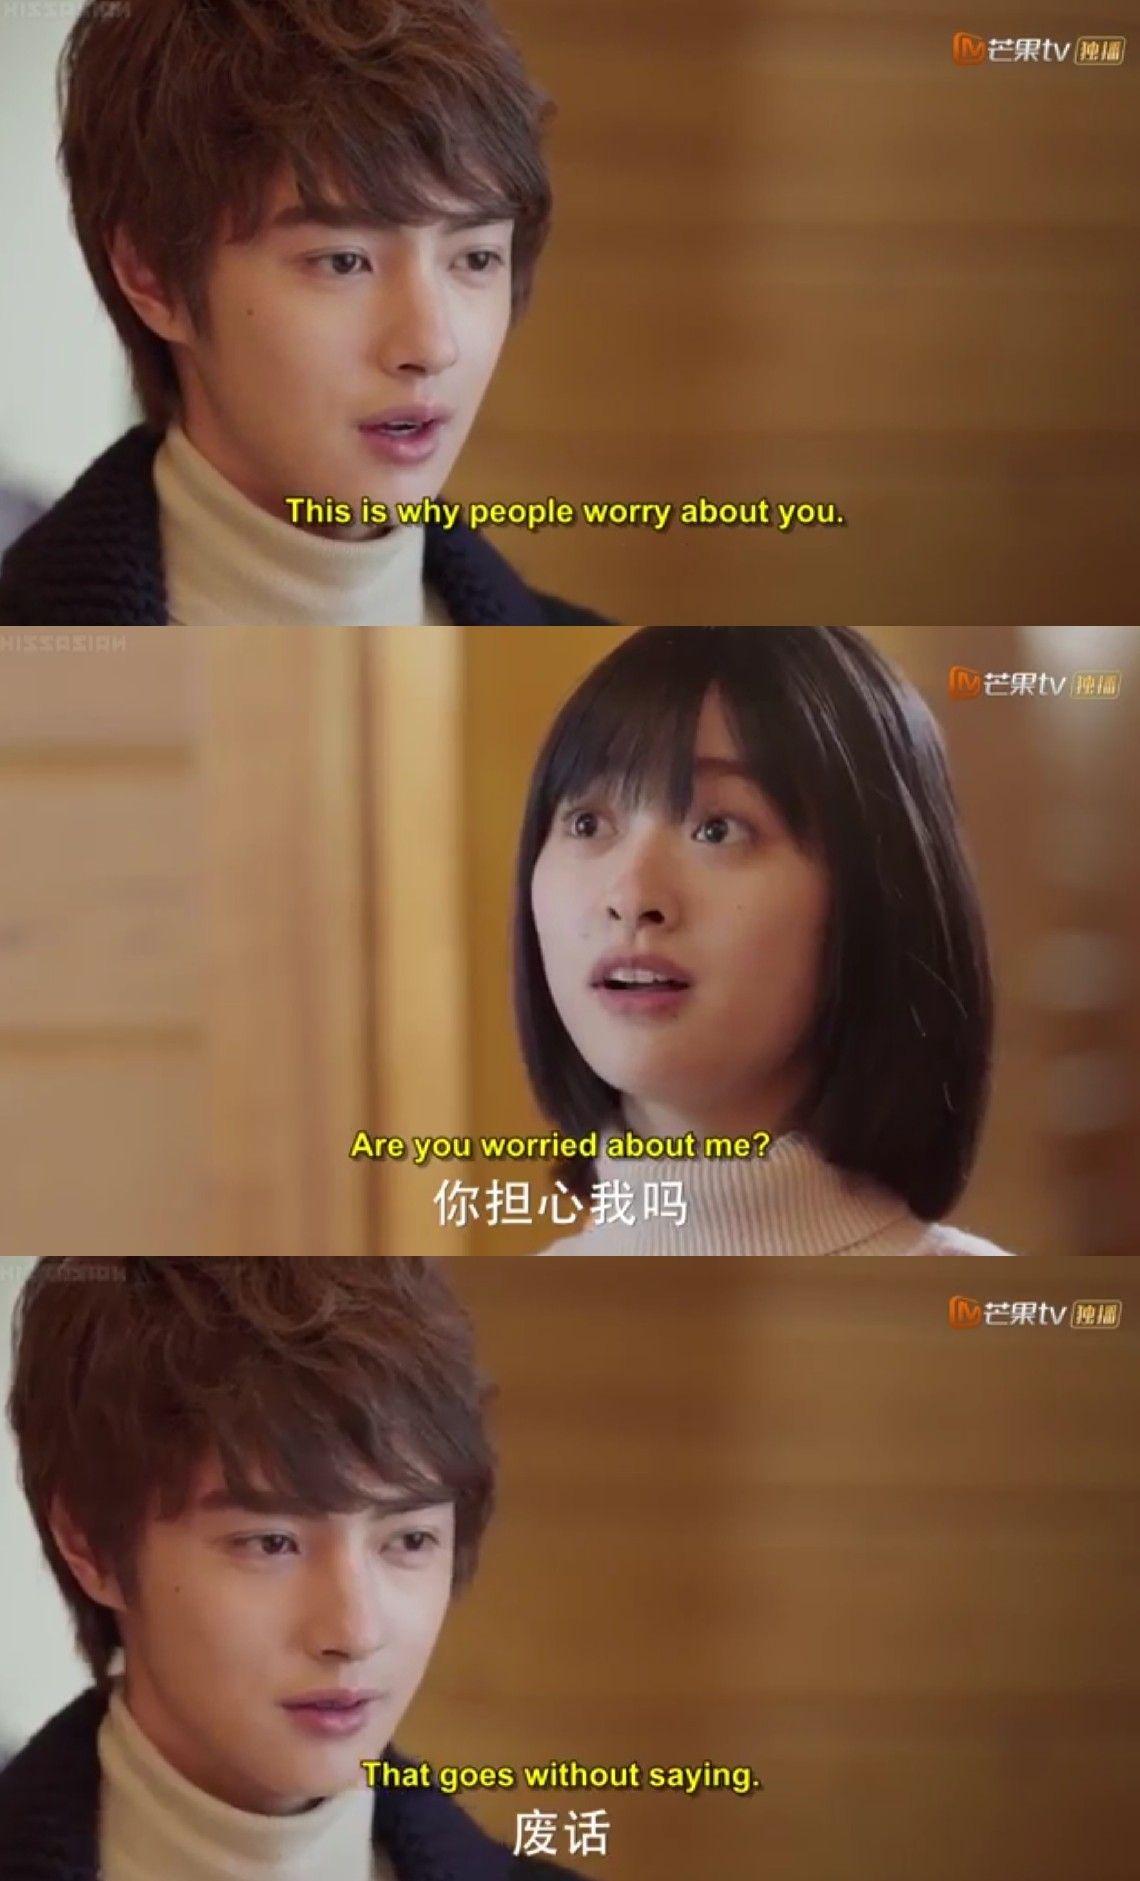 Pin By Lola Sardothien On C Drama Donghua Meteor Garden Cast